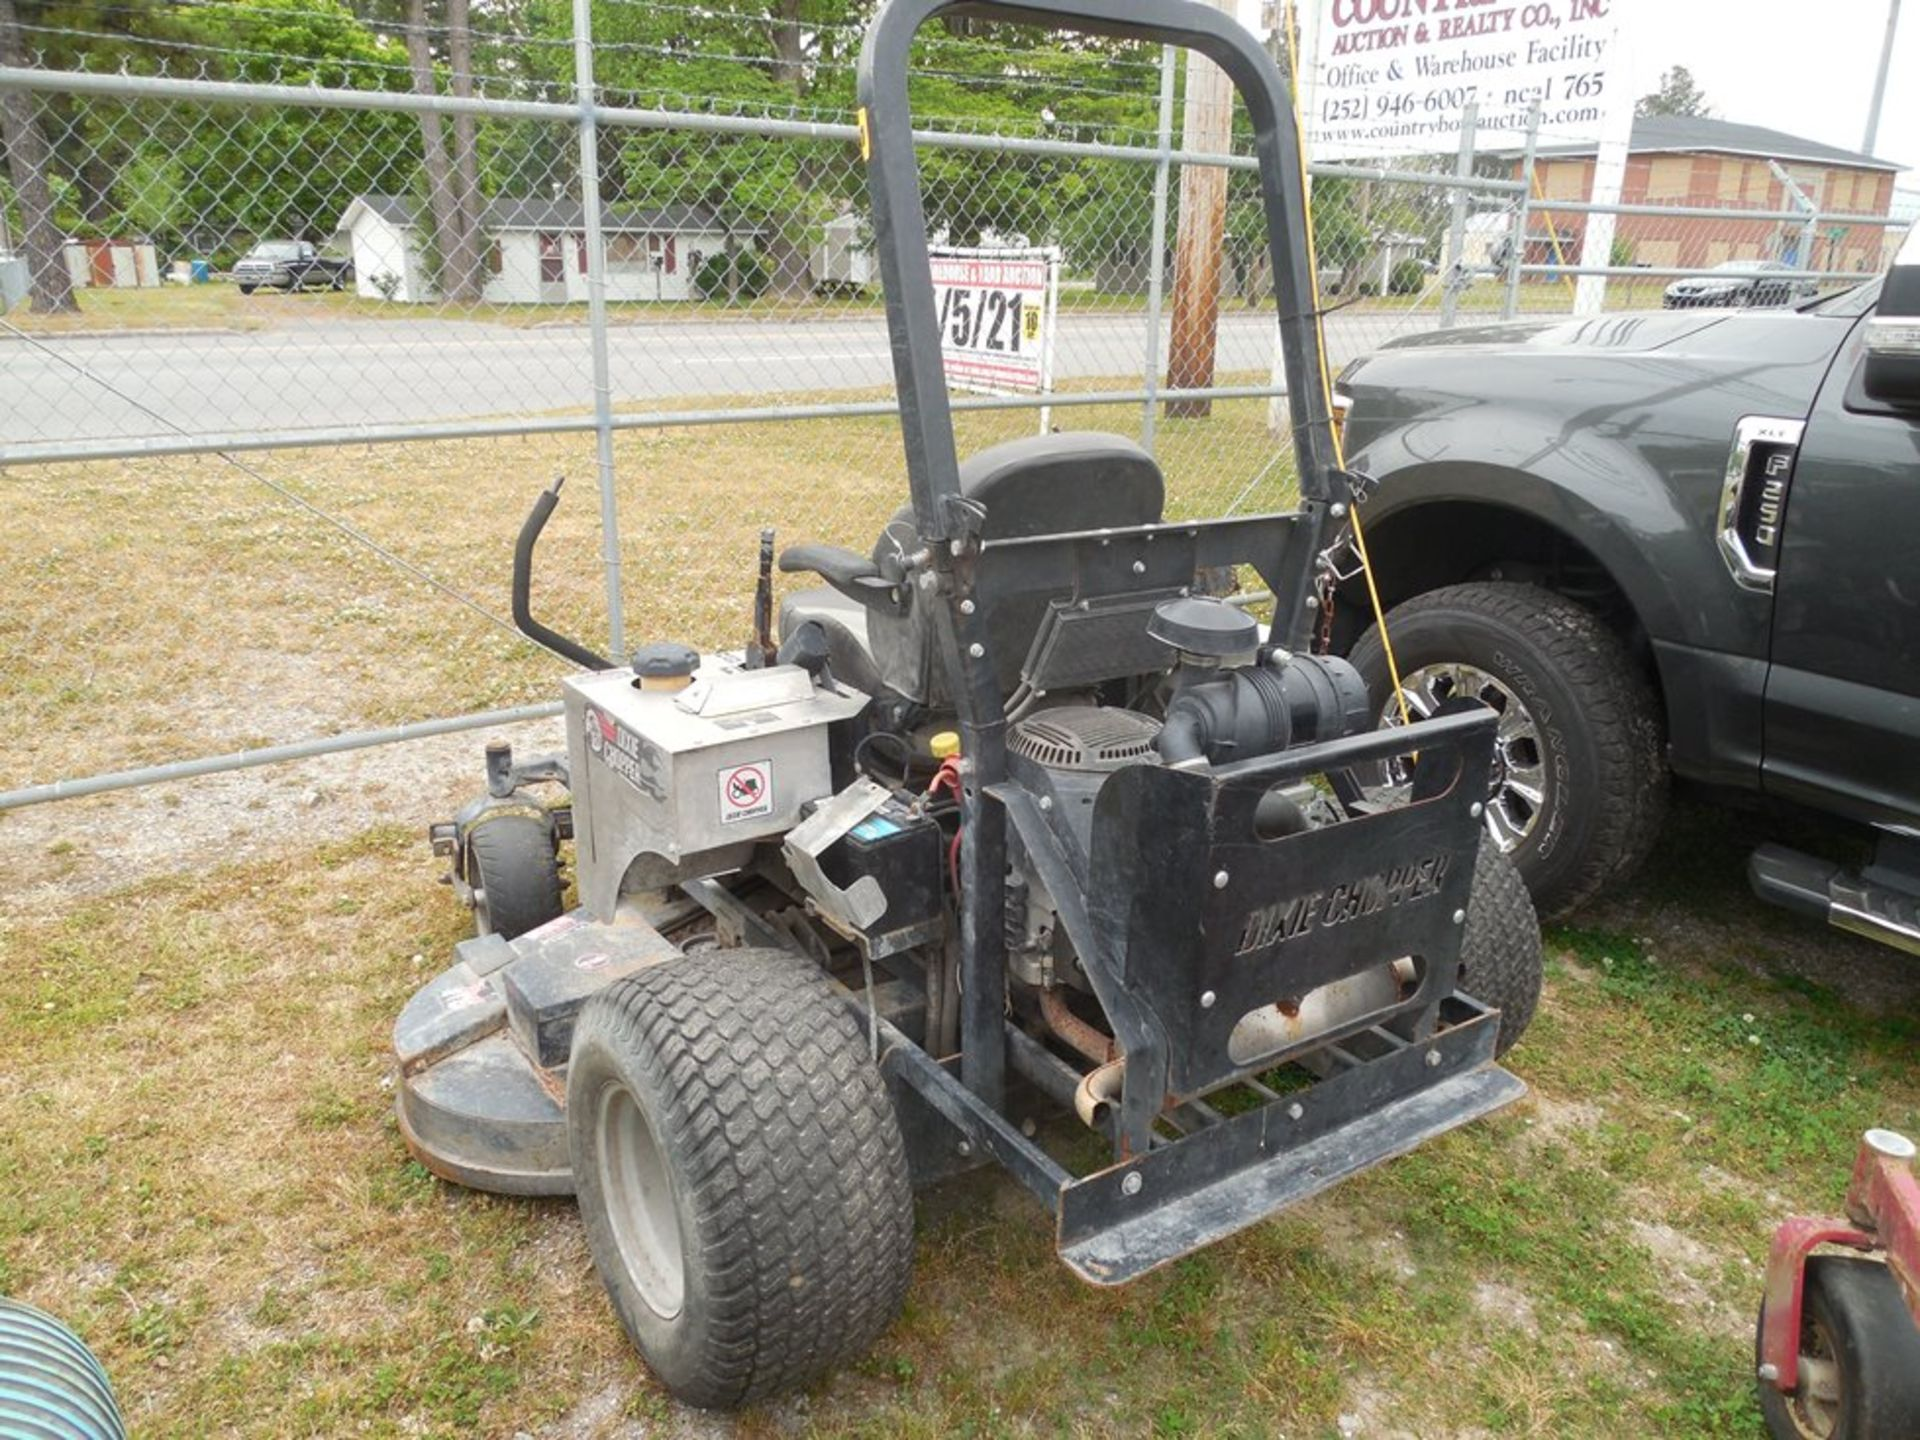 "Dixie Chopper 72"" zero-turn lawn mower Kohler engine 887 hrs showing - Image 4 of 4"